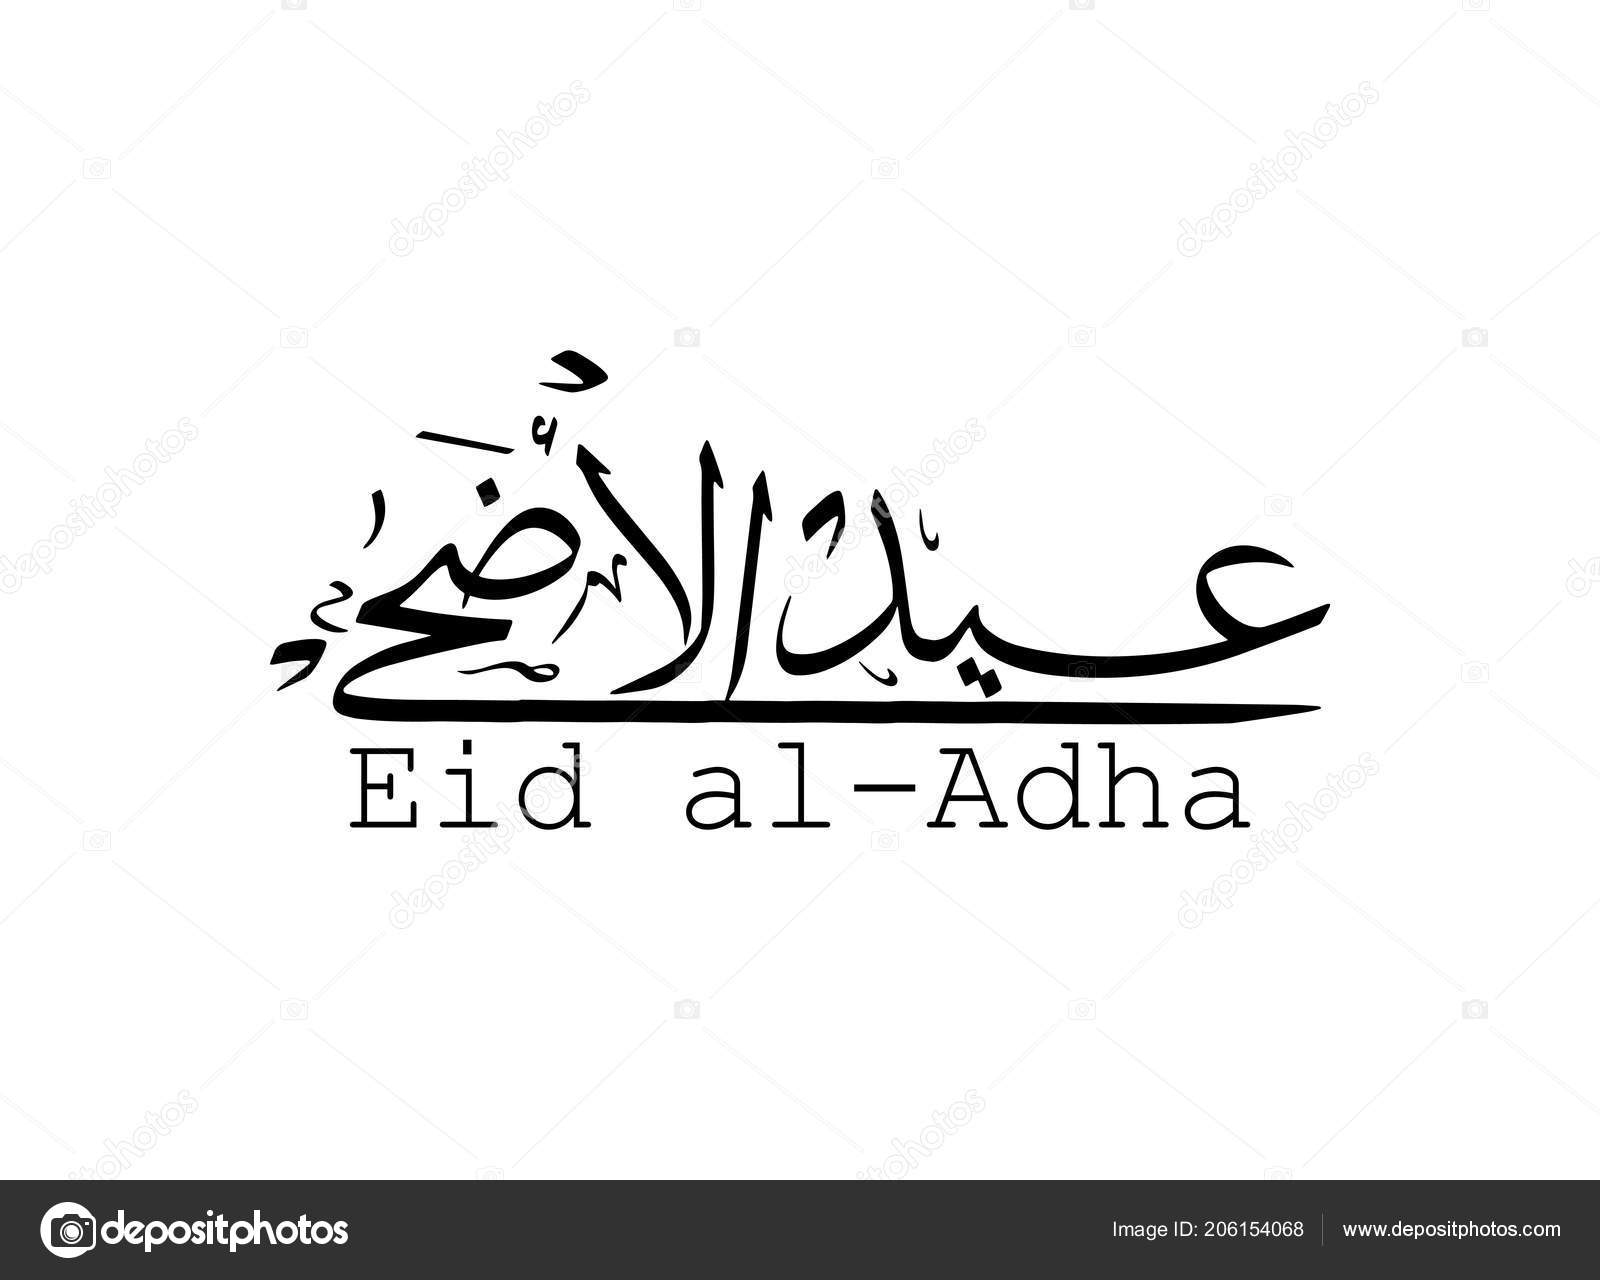 what is eid mubarak means